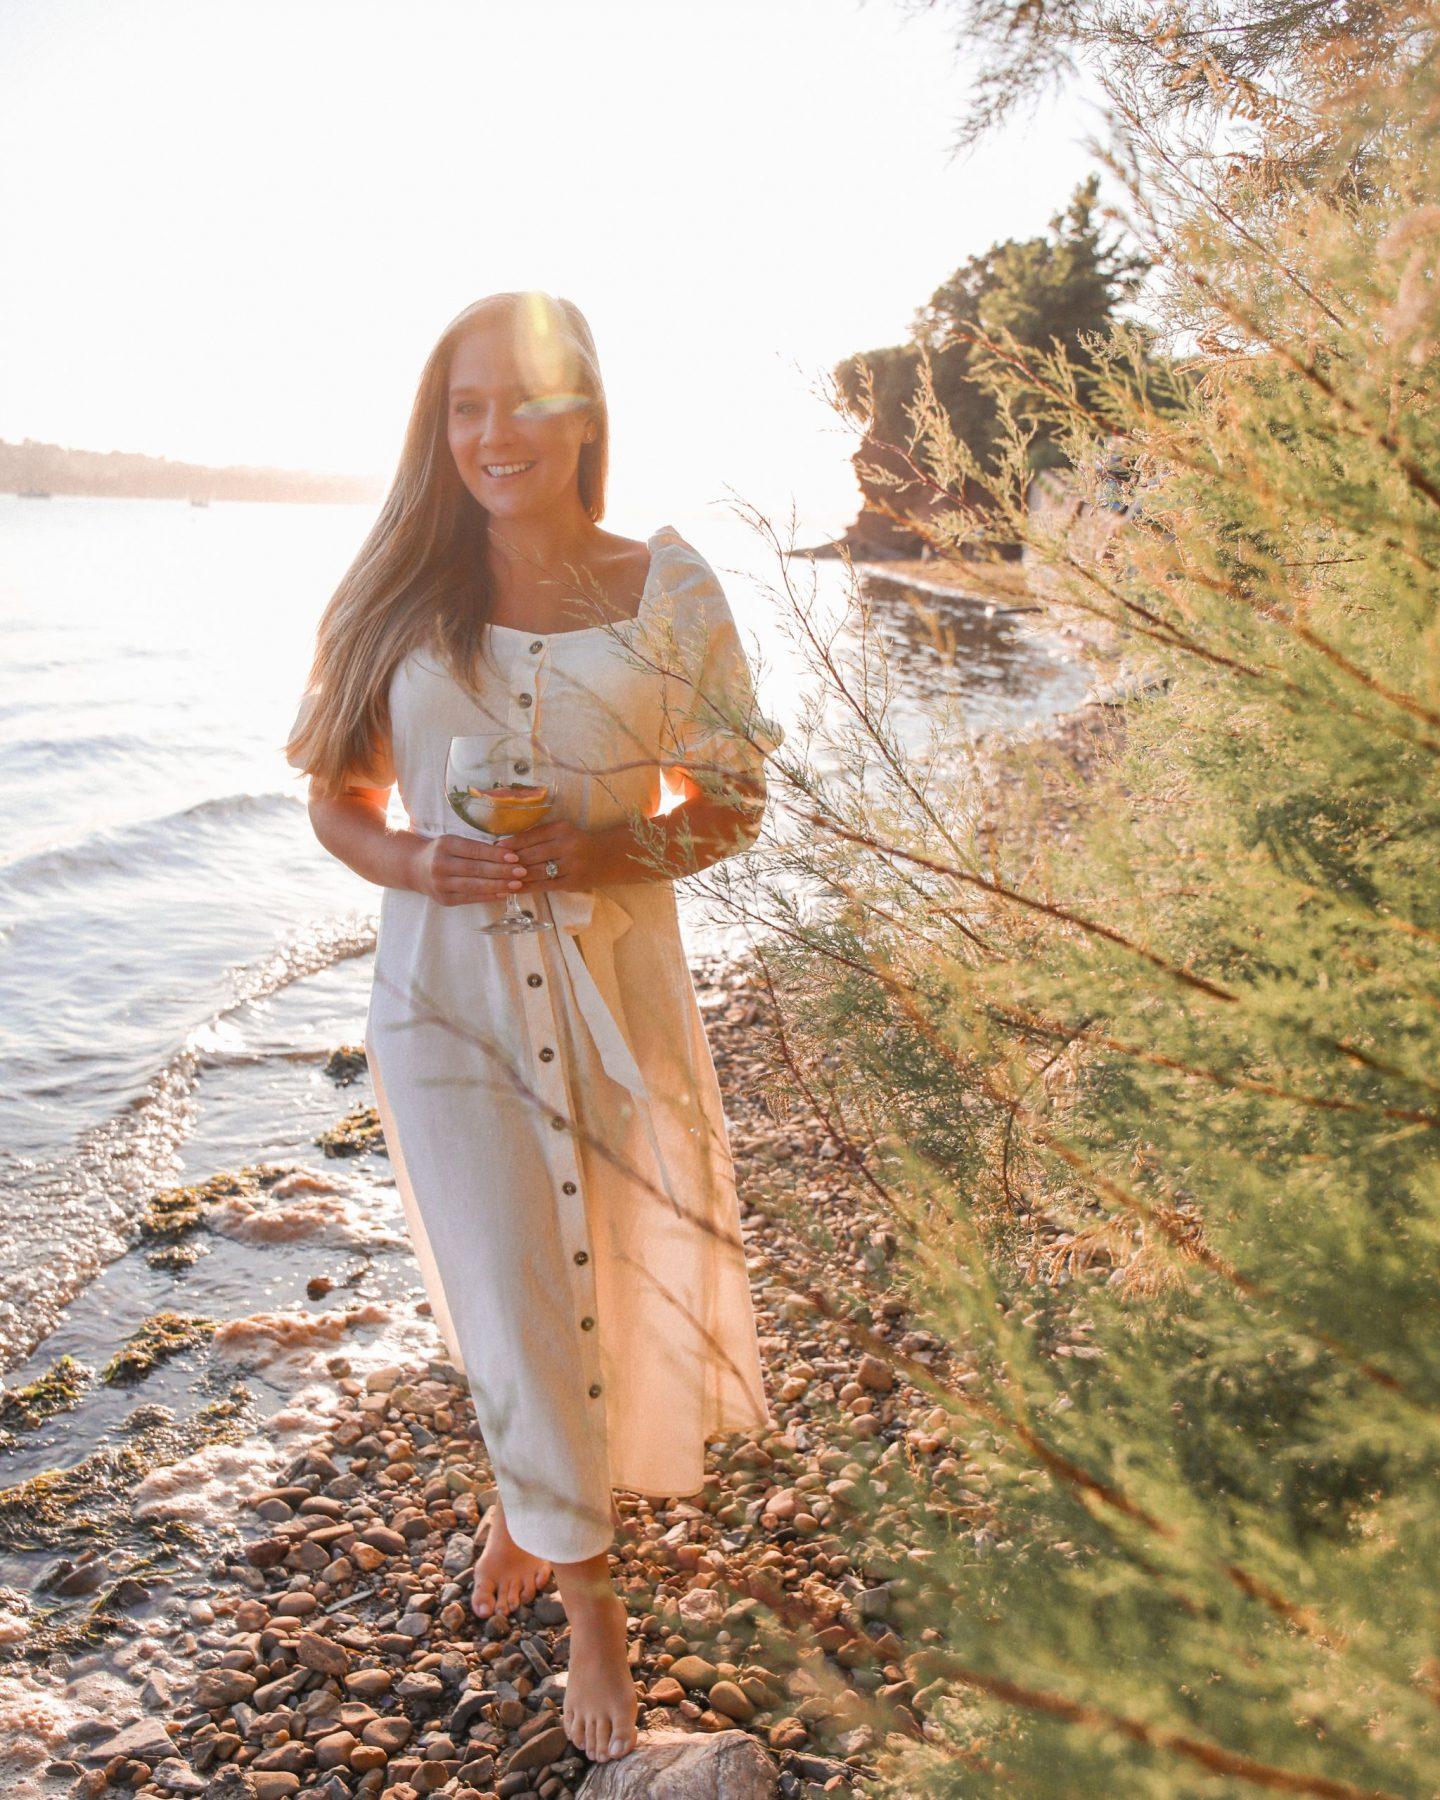 White puff-sleeved dress at sunset, Katie Heath, KALANCHOE